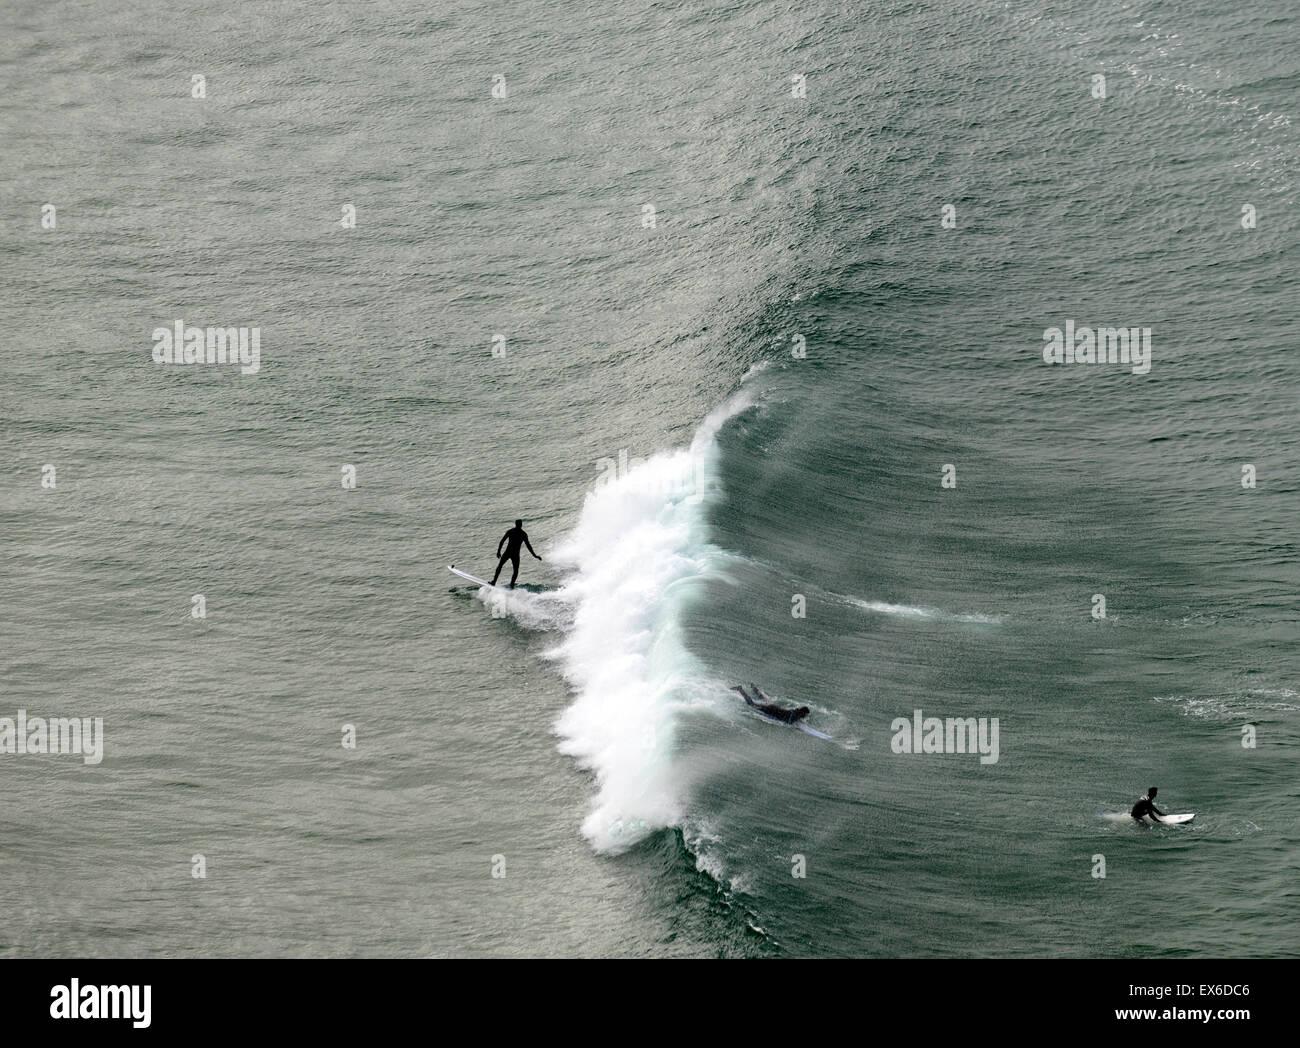 Surf surfers surfing wild atlantic way west coast RM ireland - Stock Image